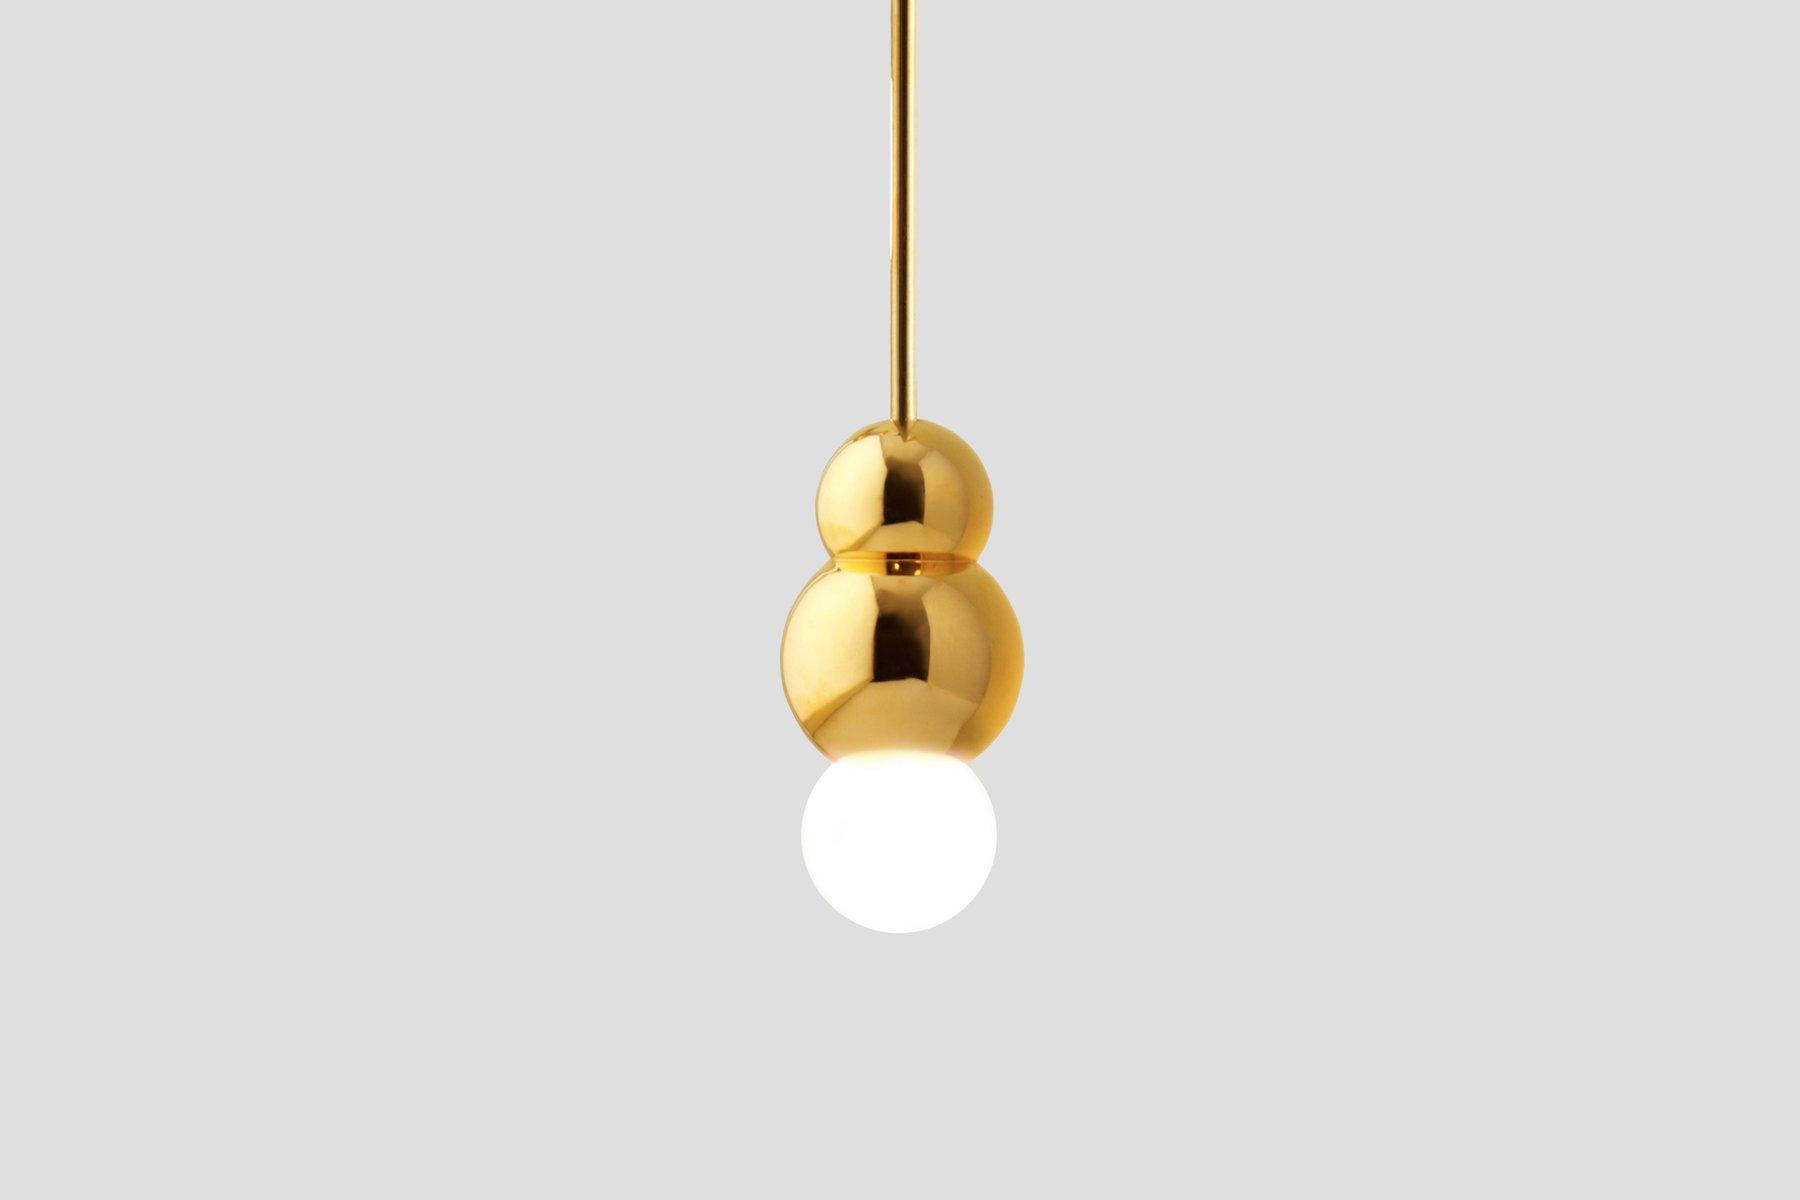 Brass Ball Light (Small) by Michael Anastassiades